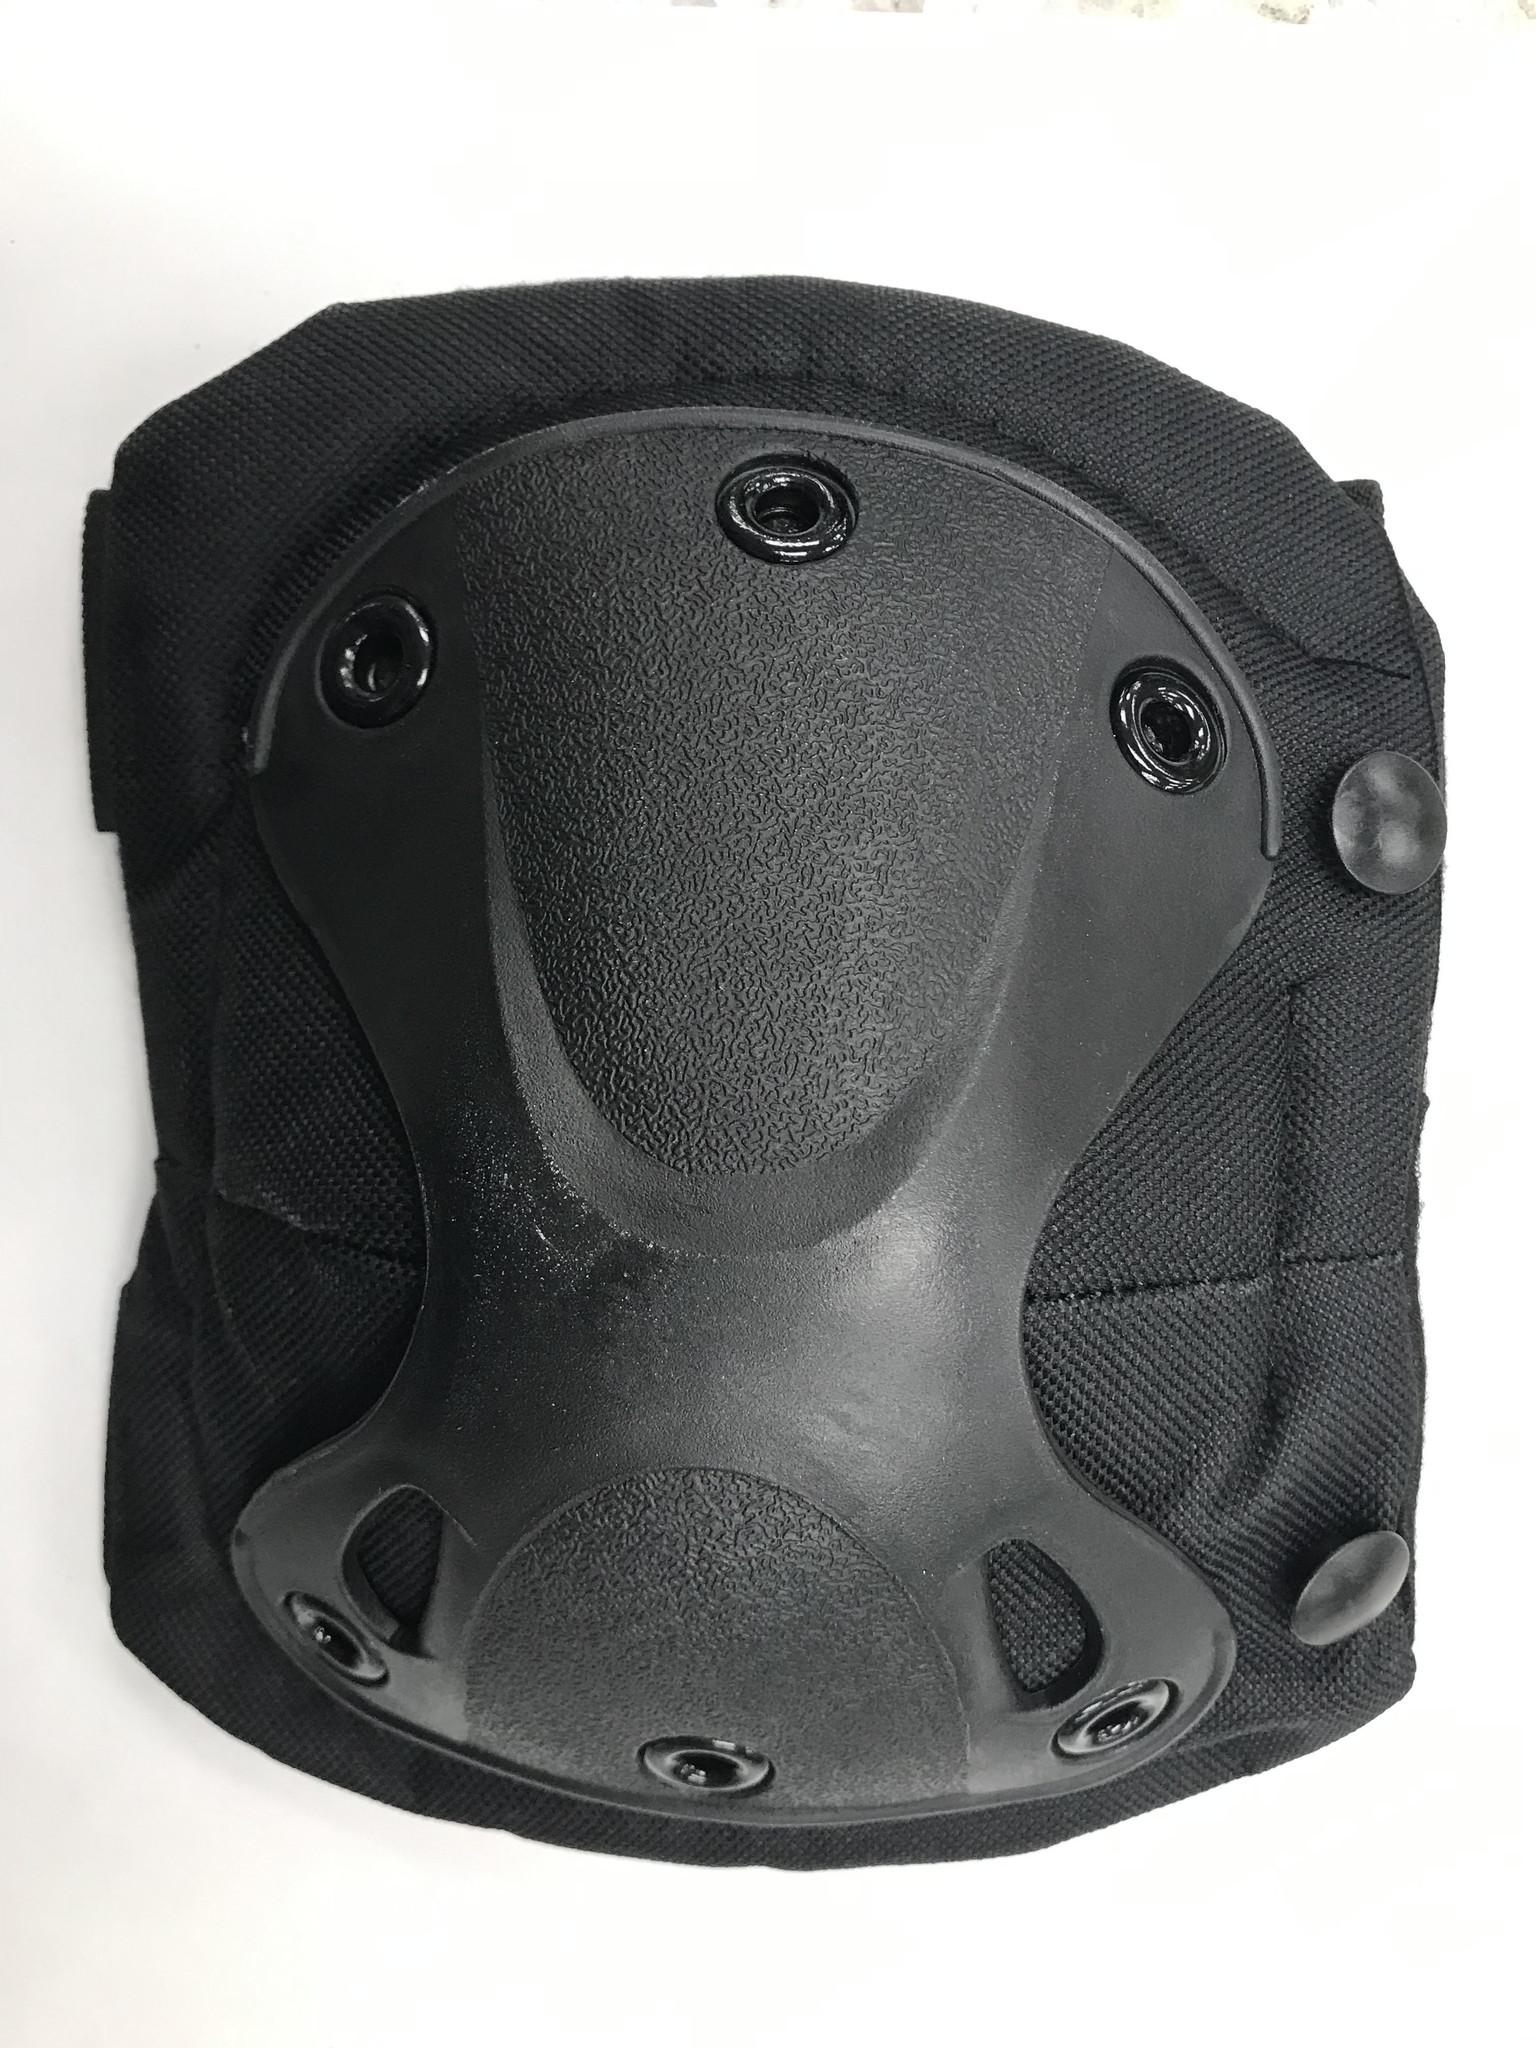 Krousis Tactical Knee & Elbow Pad Set Black